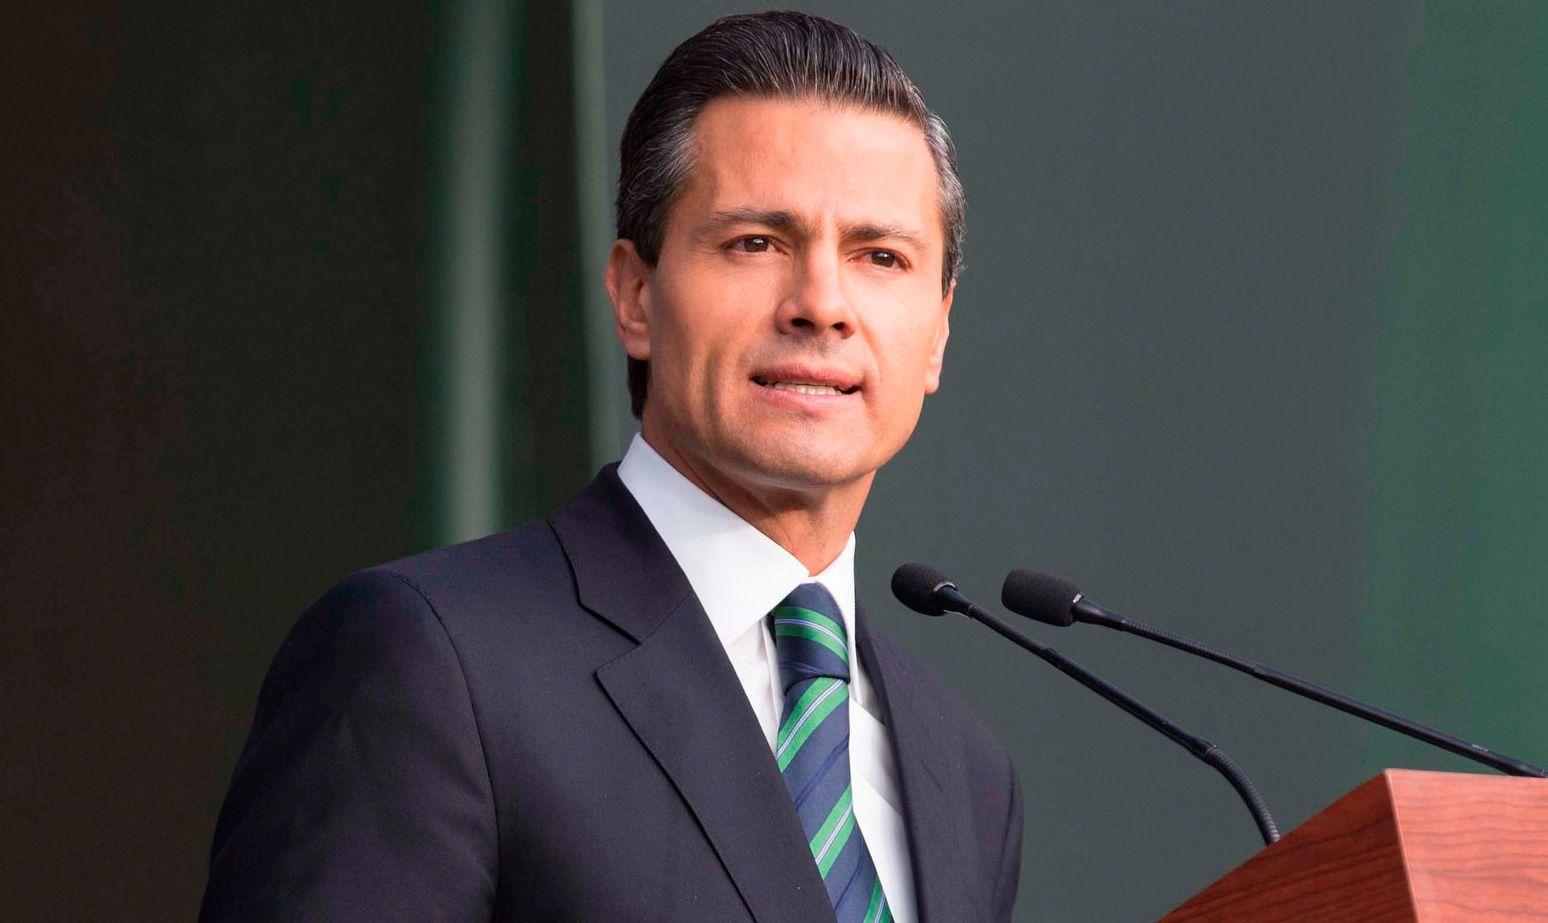 Jim Mattis asistirá a festejo de Independencia de México